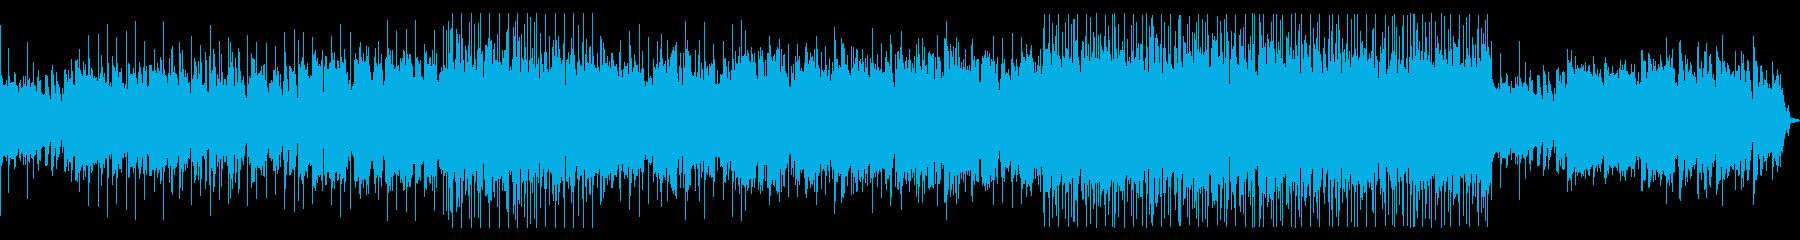 EXILE風ヒットチャートポップスの再生済みの波形